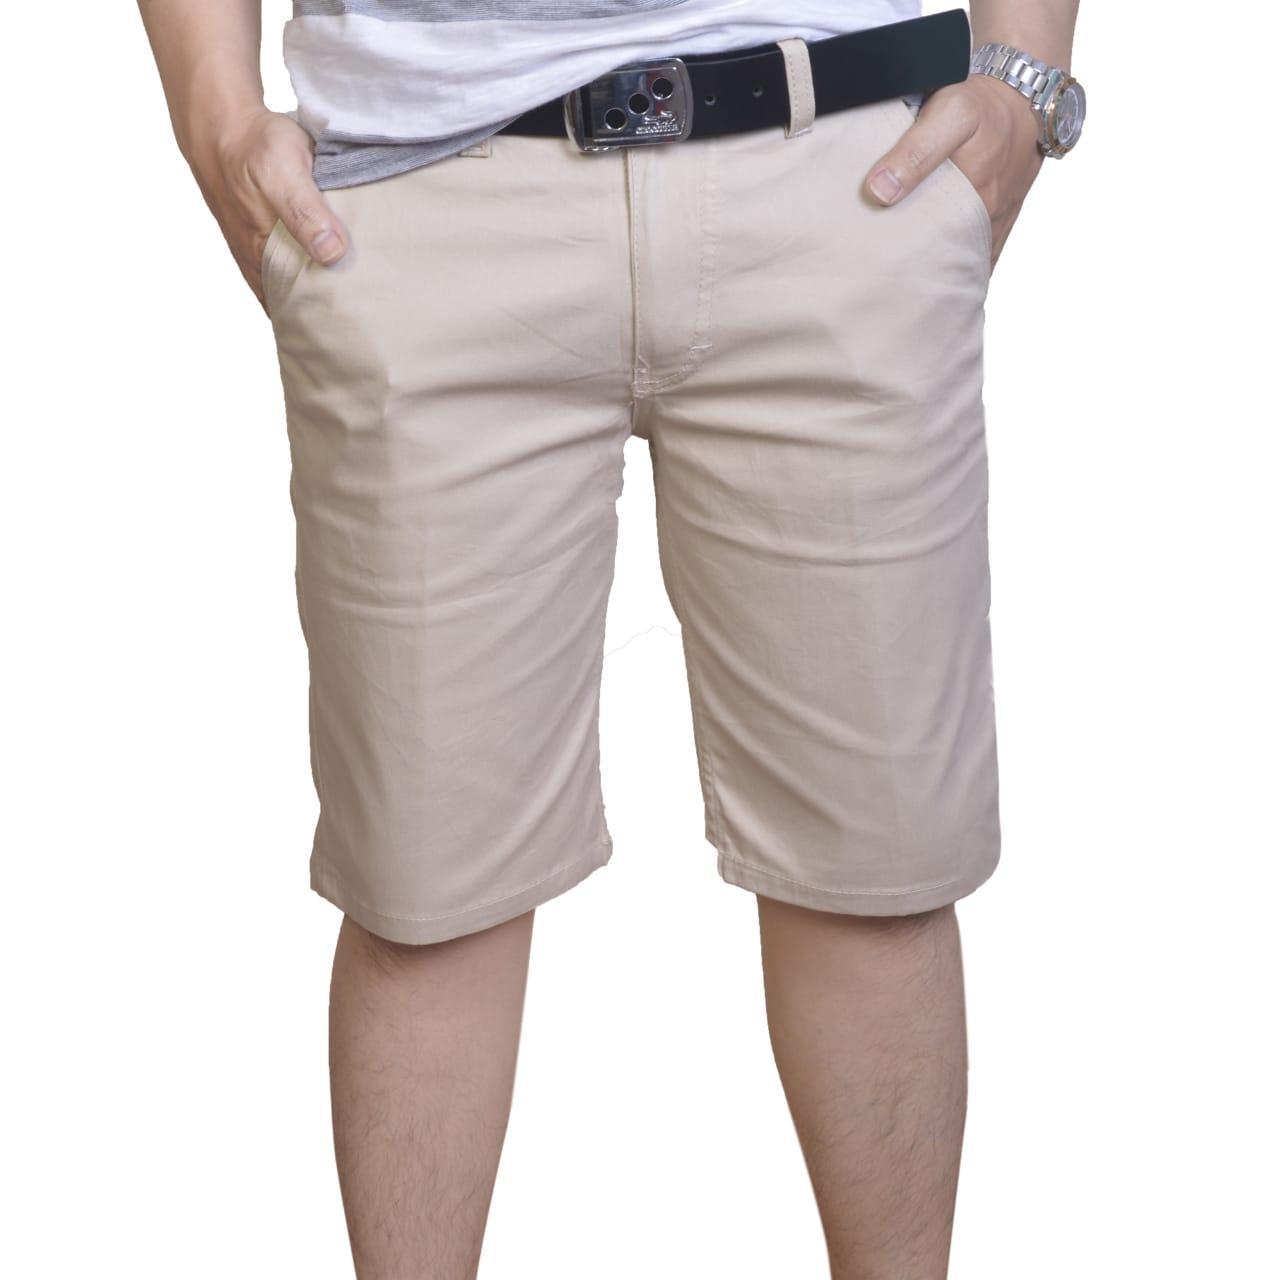 Jual Celana Pendek Pria Terbaik Motif Size Newborn 3 Pcs Chino Cargo Fashion Pakaian Jahitan Rapi